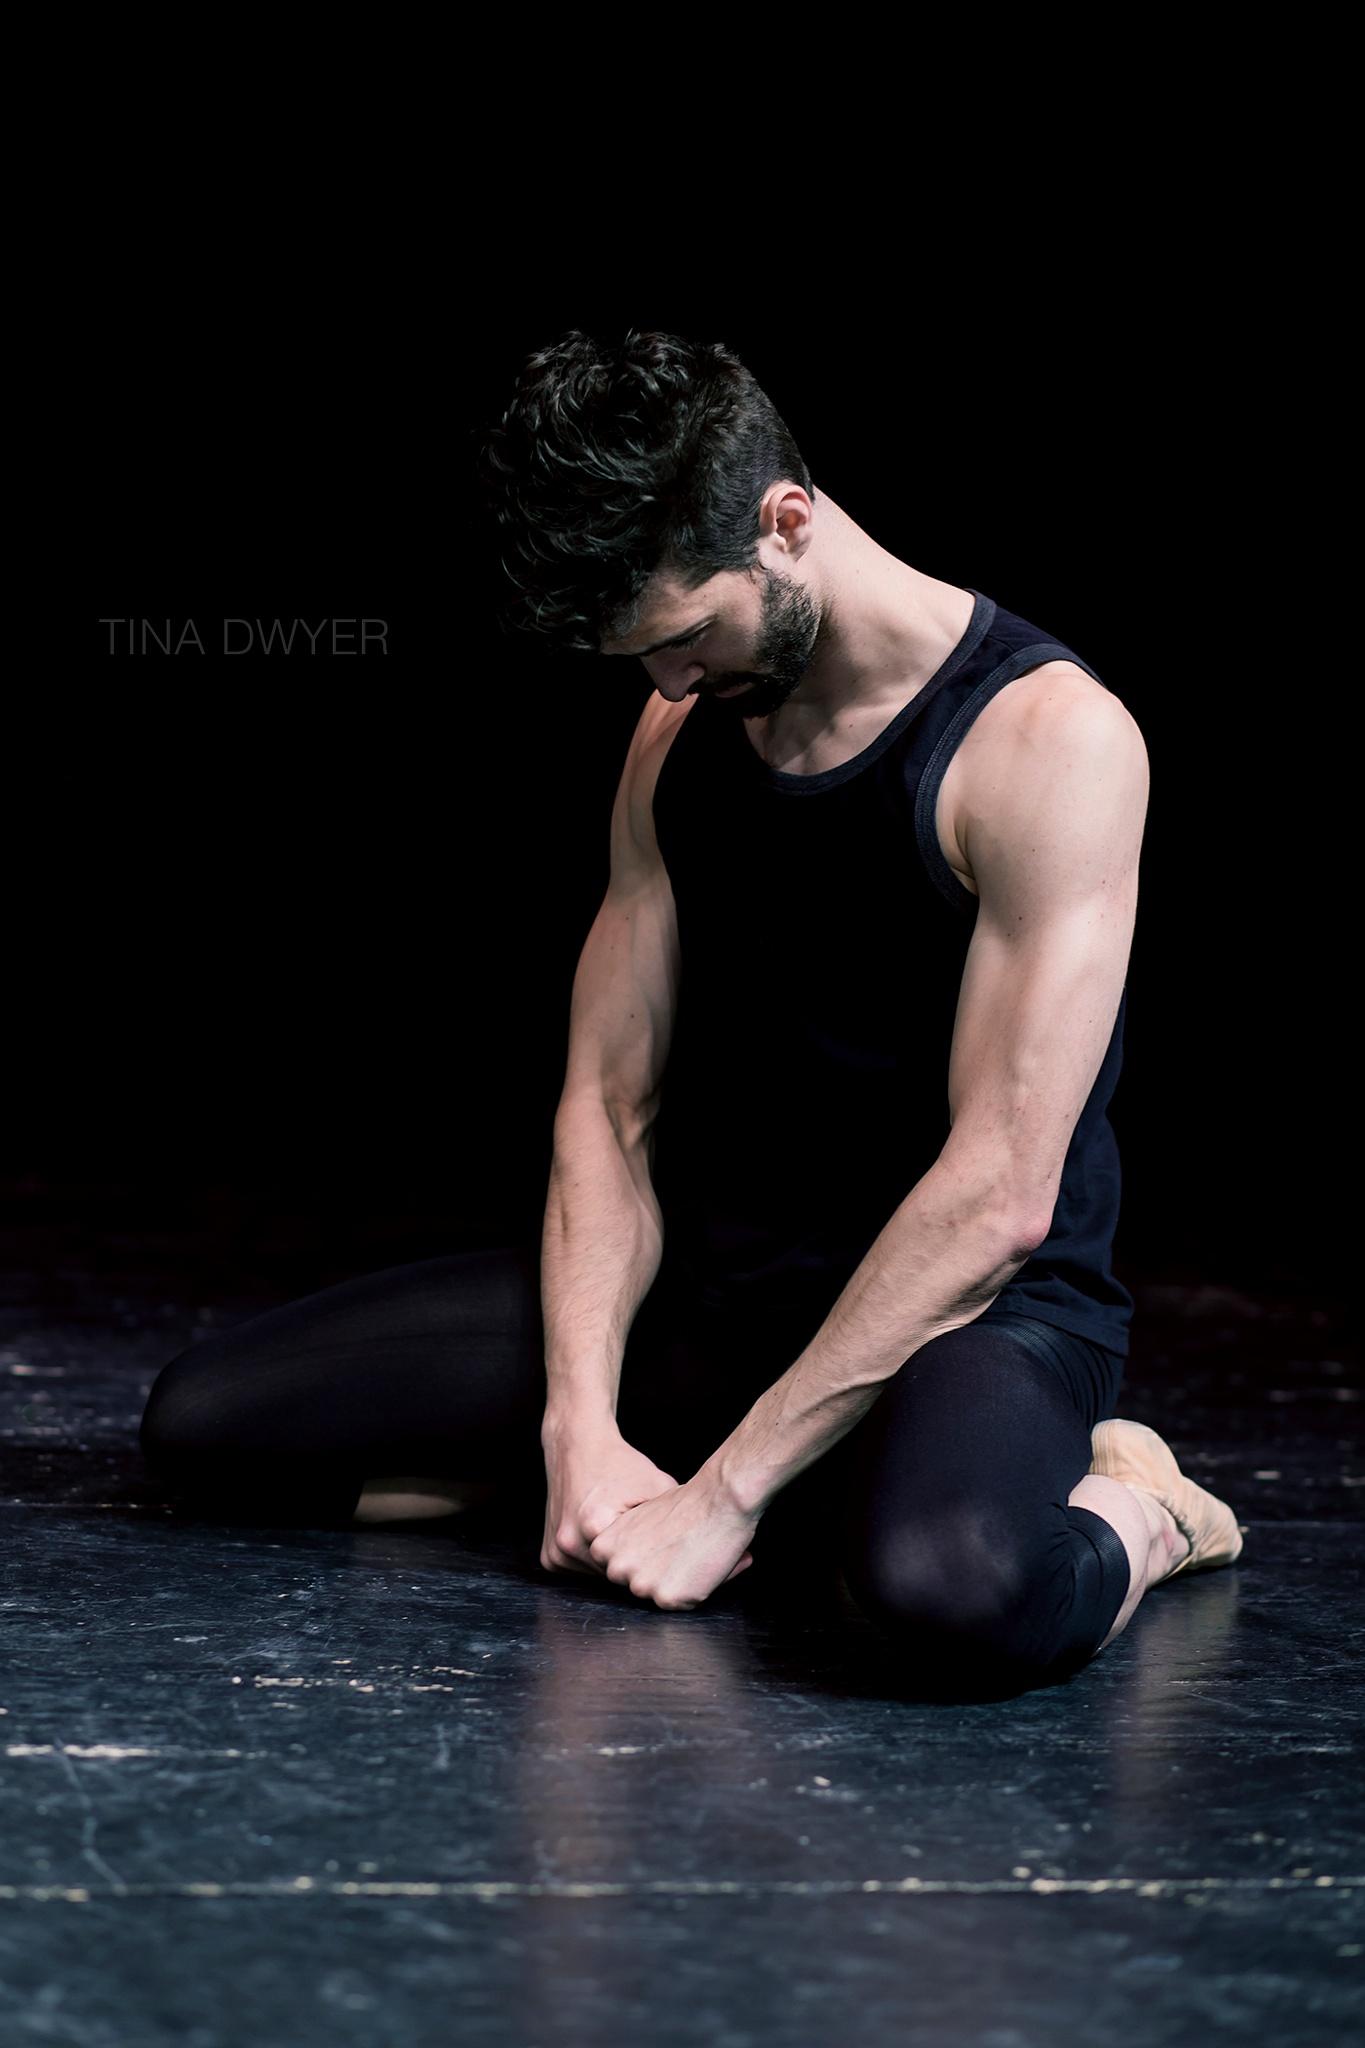 Jules by Tina Dwyer